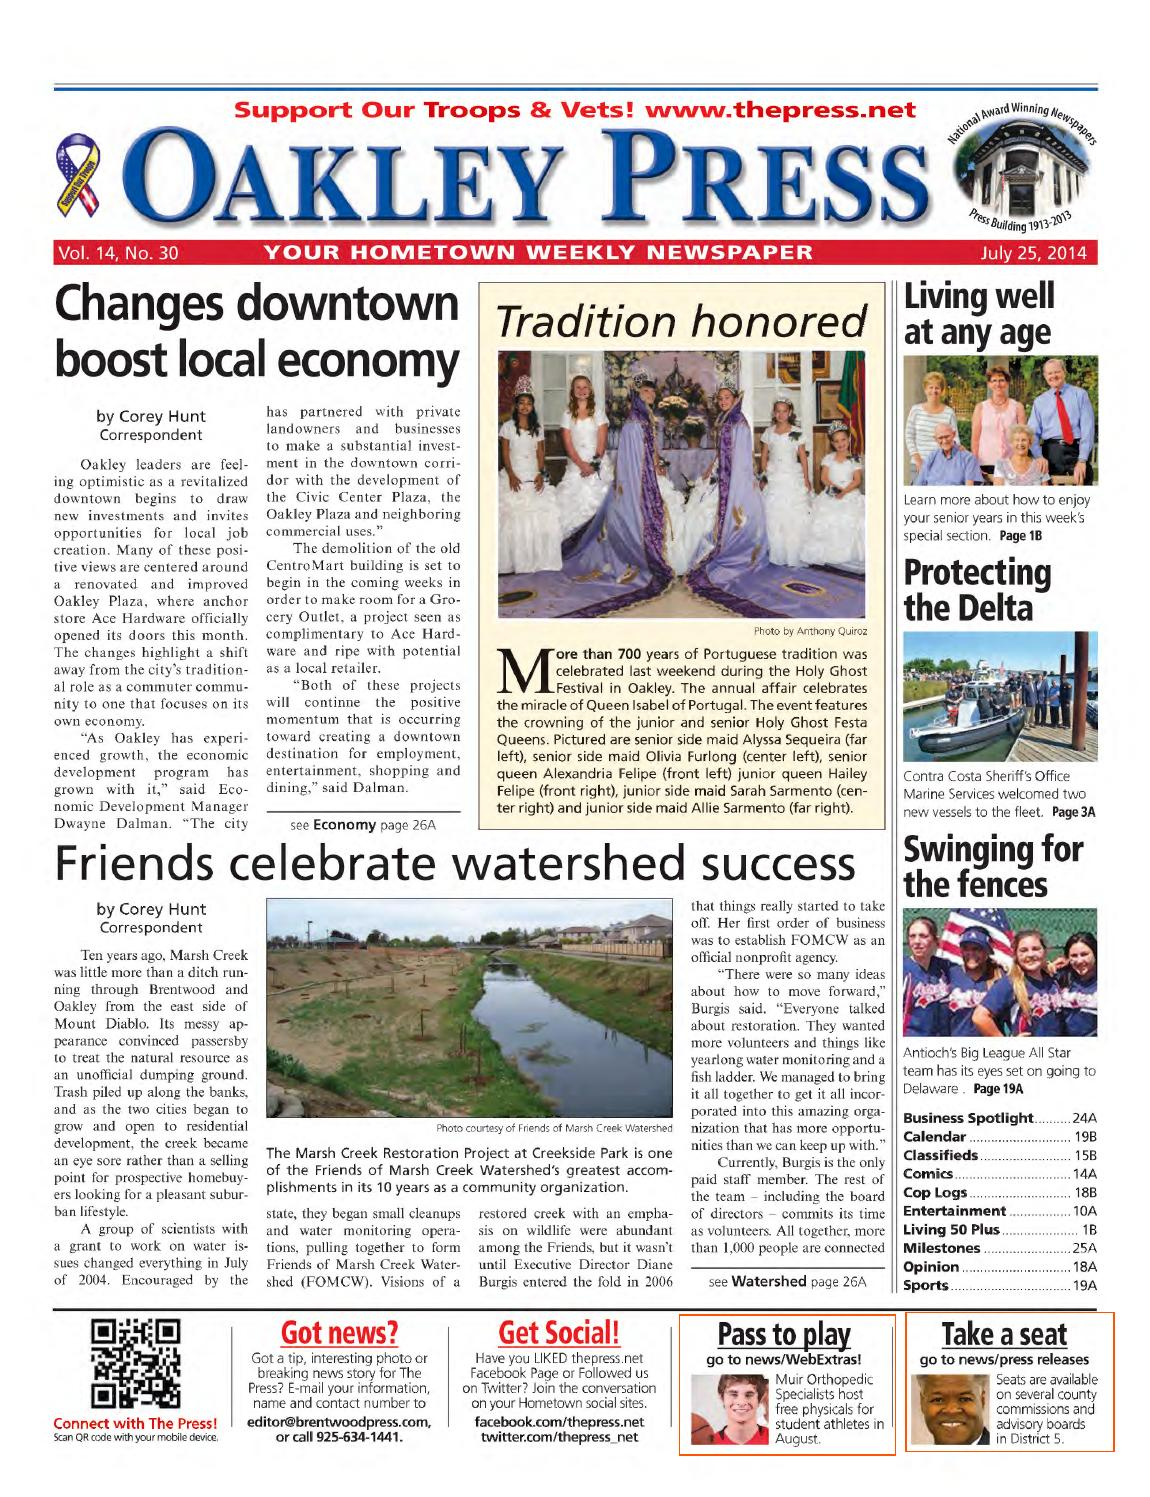 Oakley Press 07.25.14 by Brentwood Press & Publishing - issuu